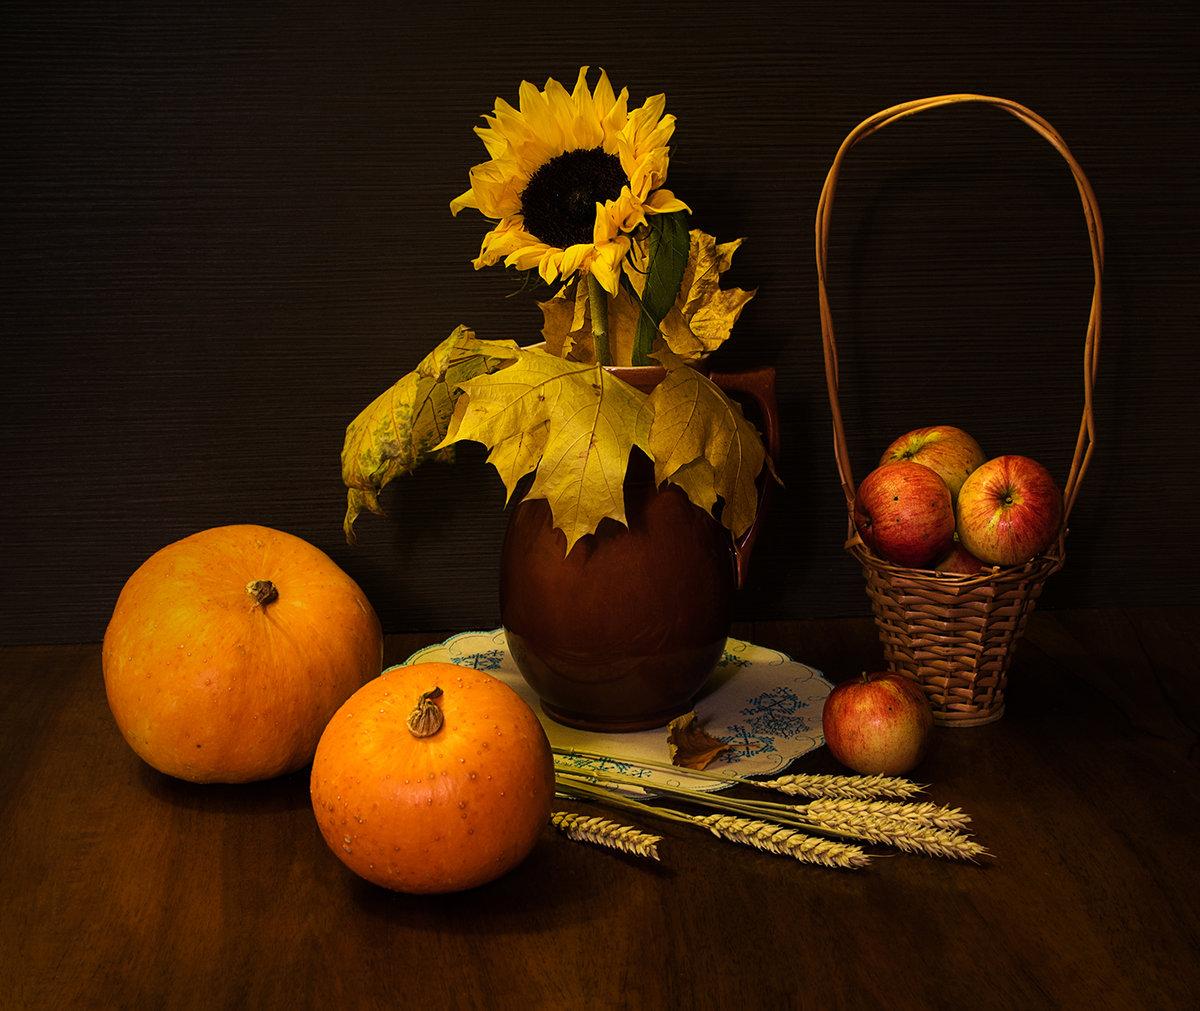 Картинки натюрморта осень